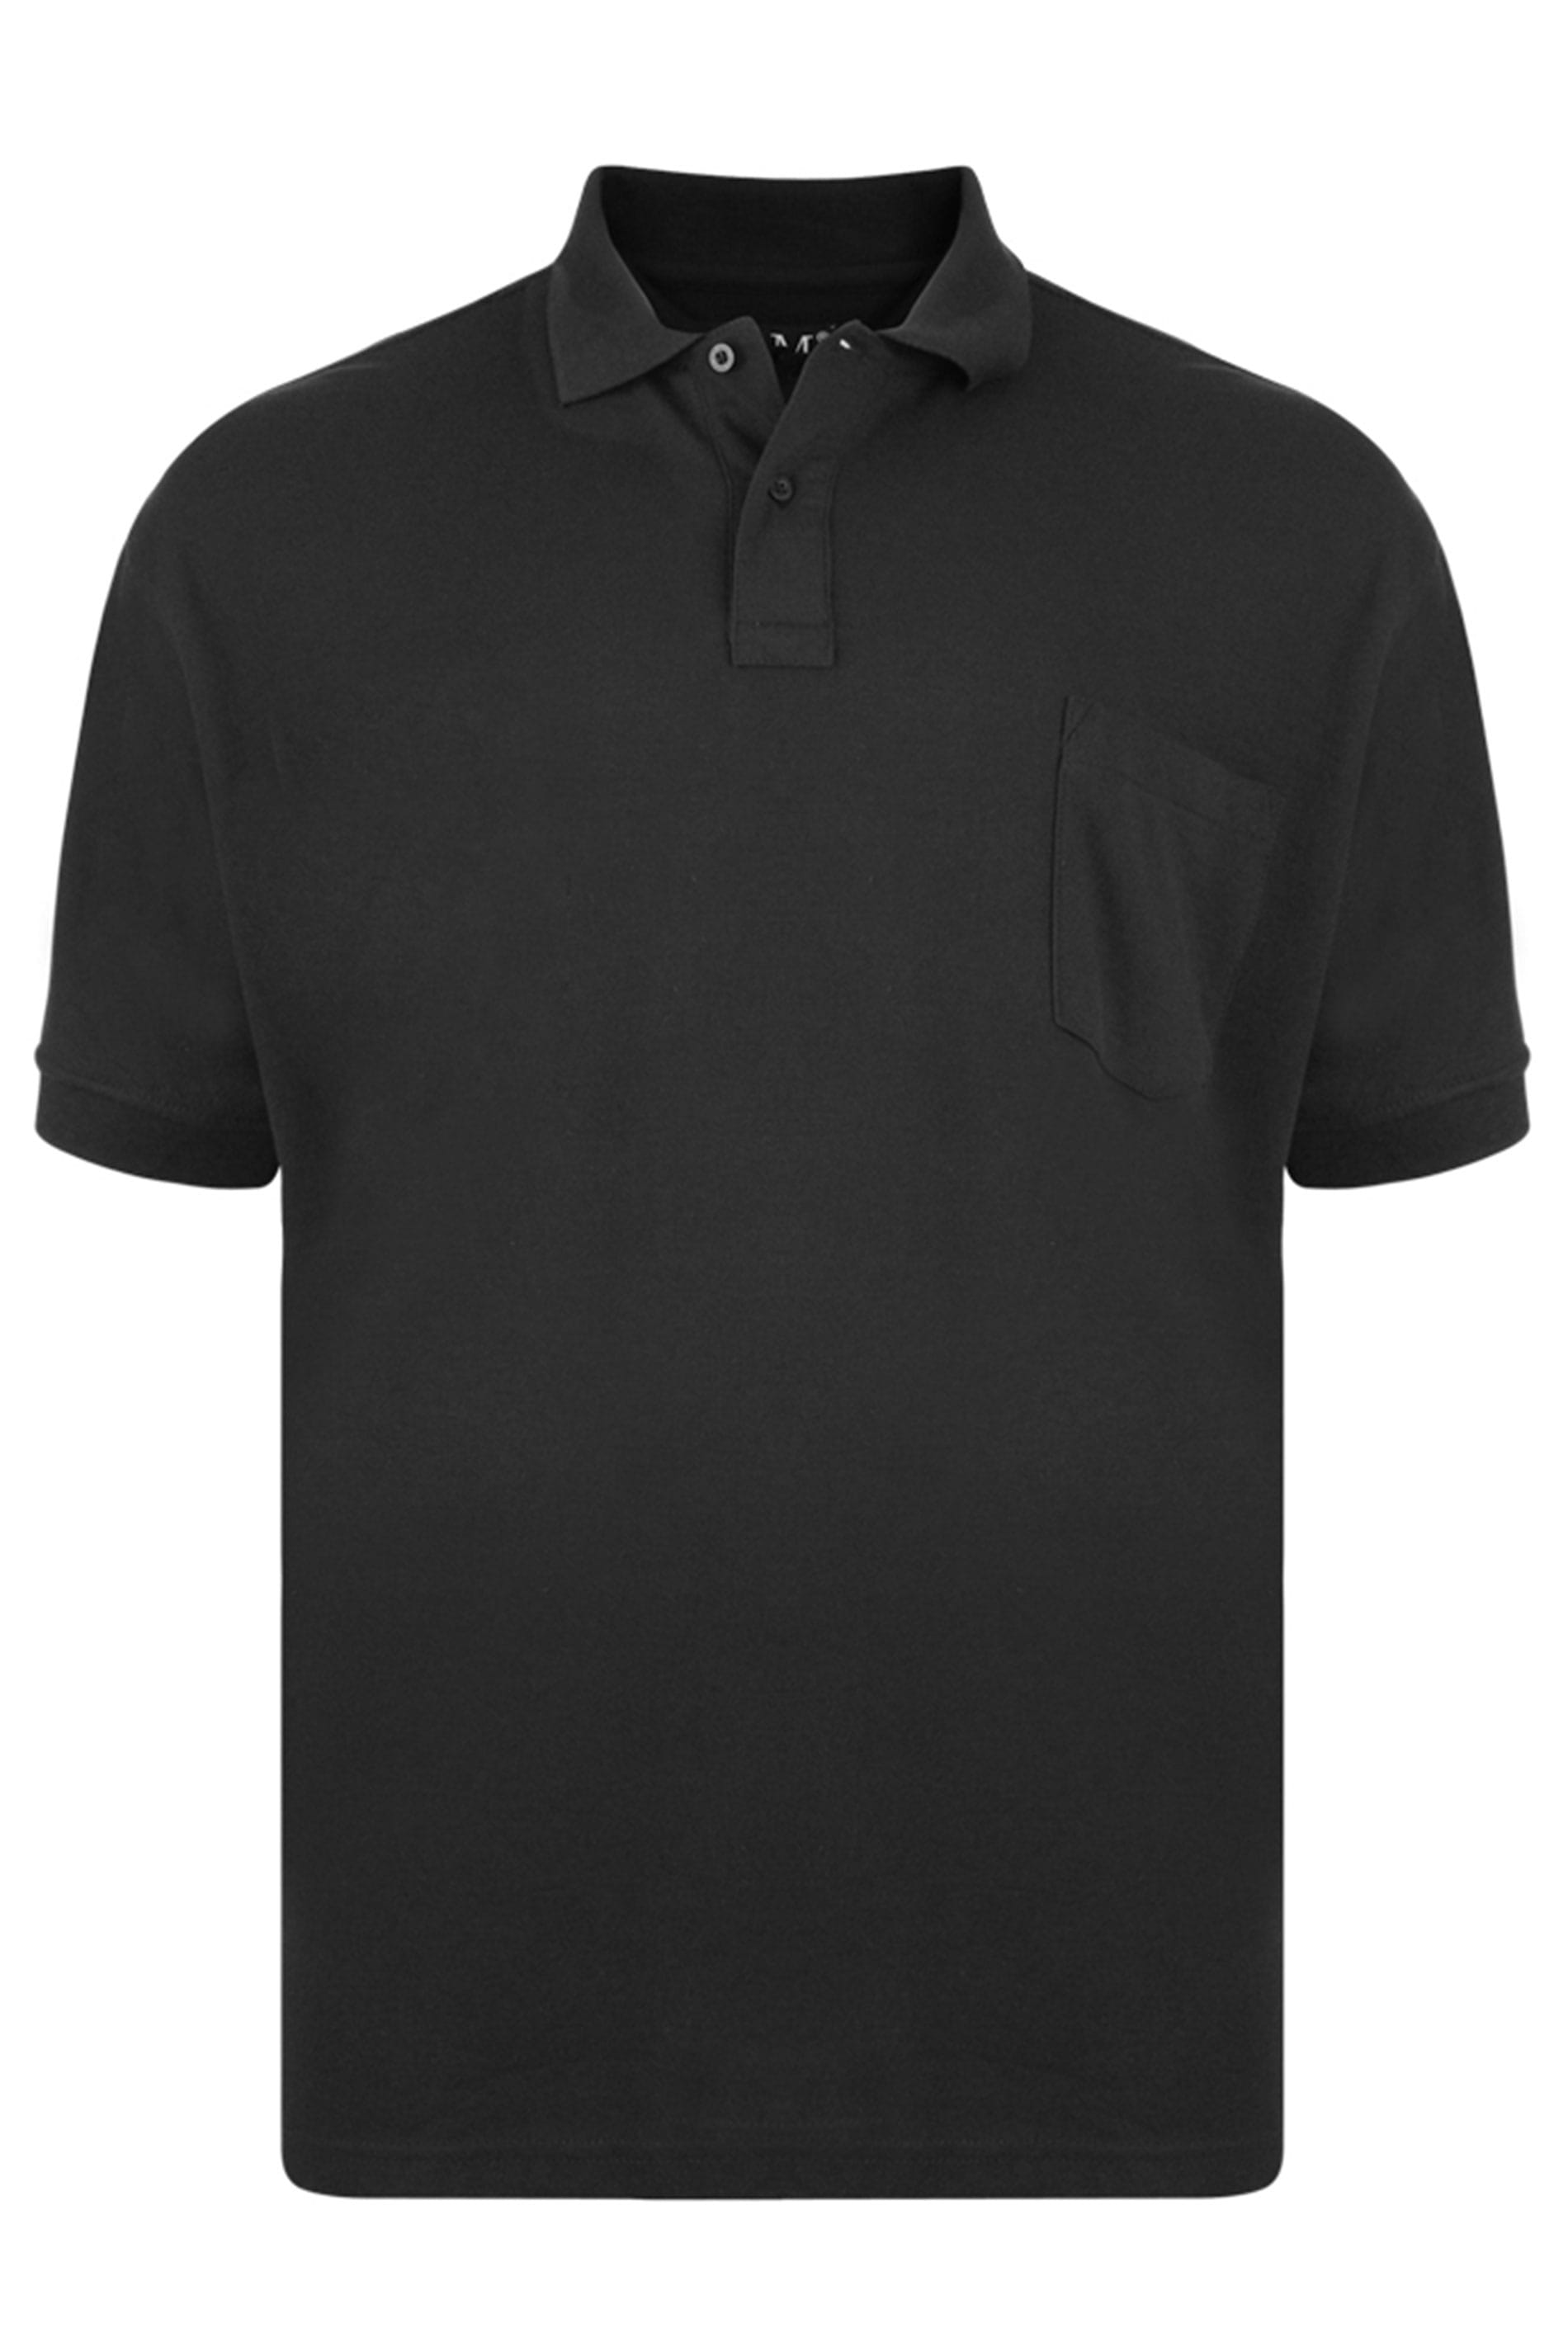 KAM Black Pocket Polo Shirt